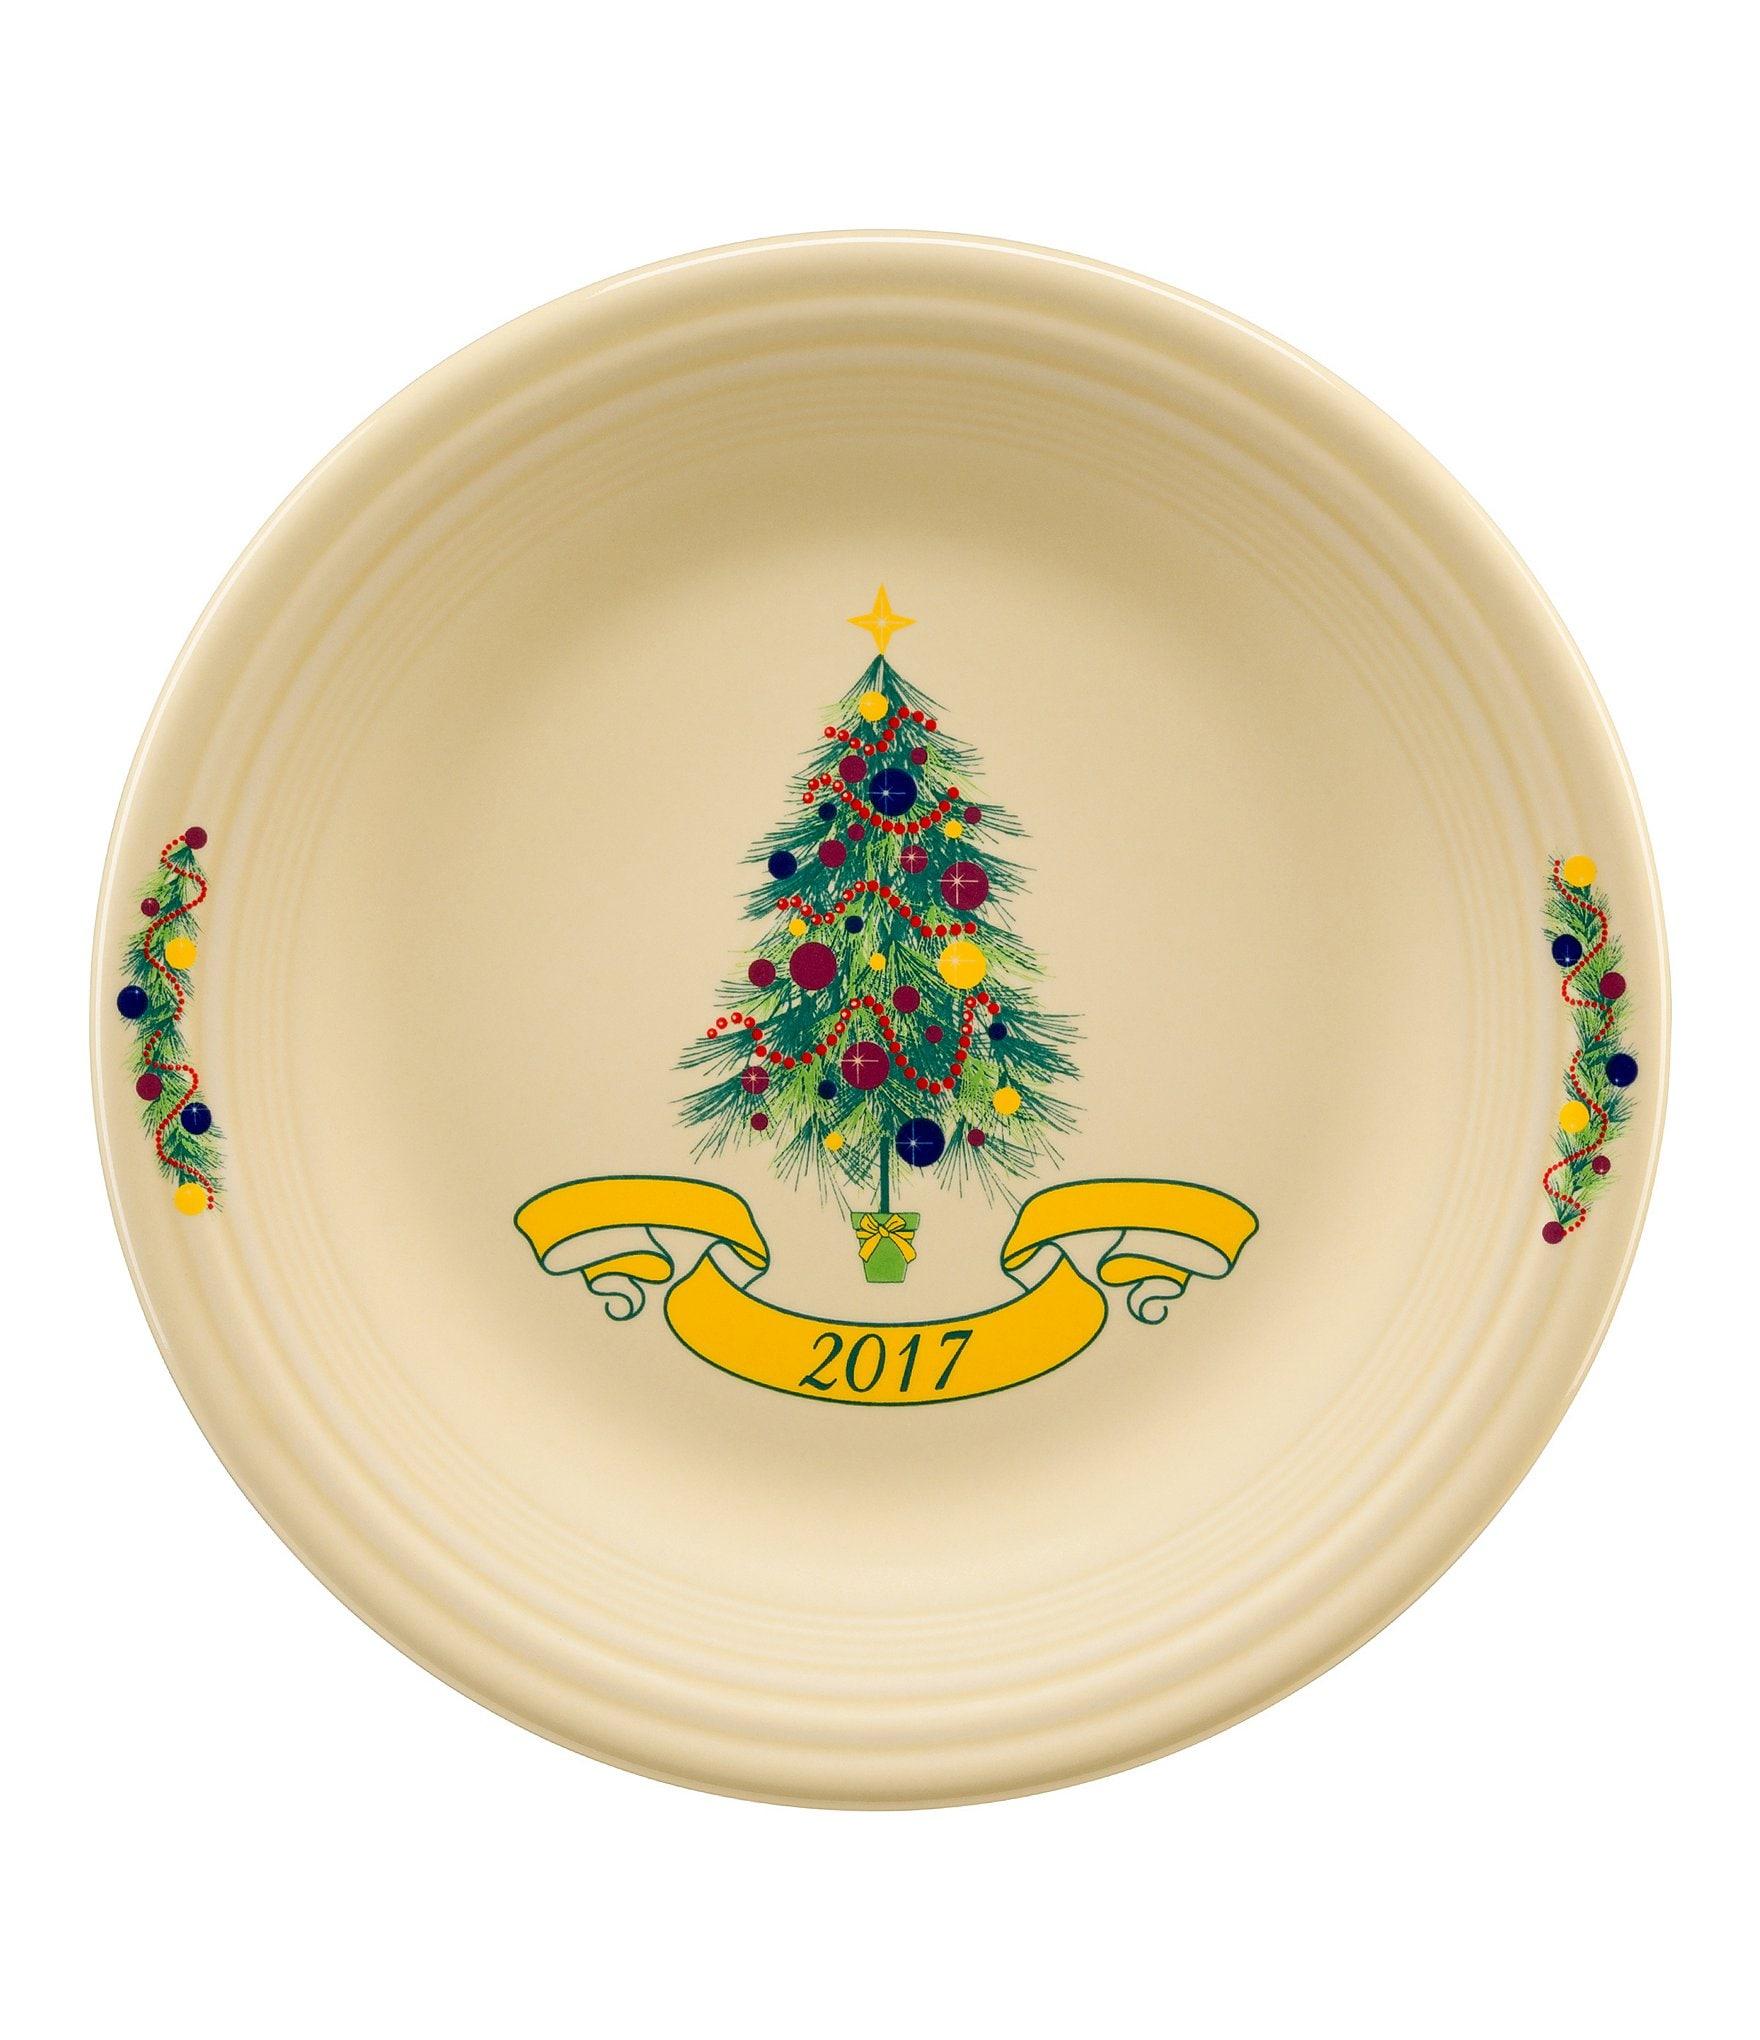 Fiesta Dillards Com - Fiesta Christmas Tree Dinnerware